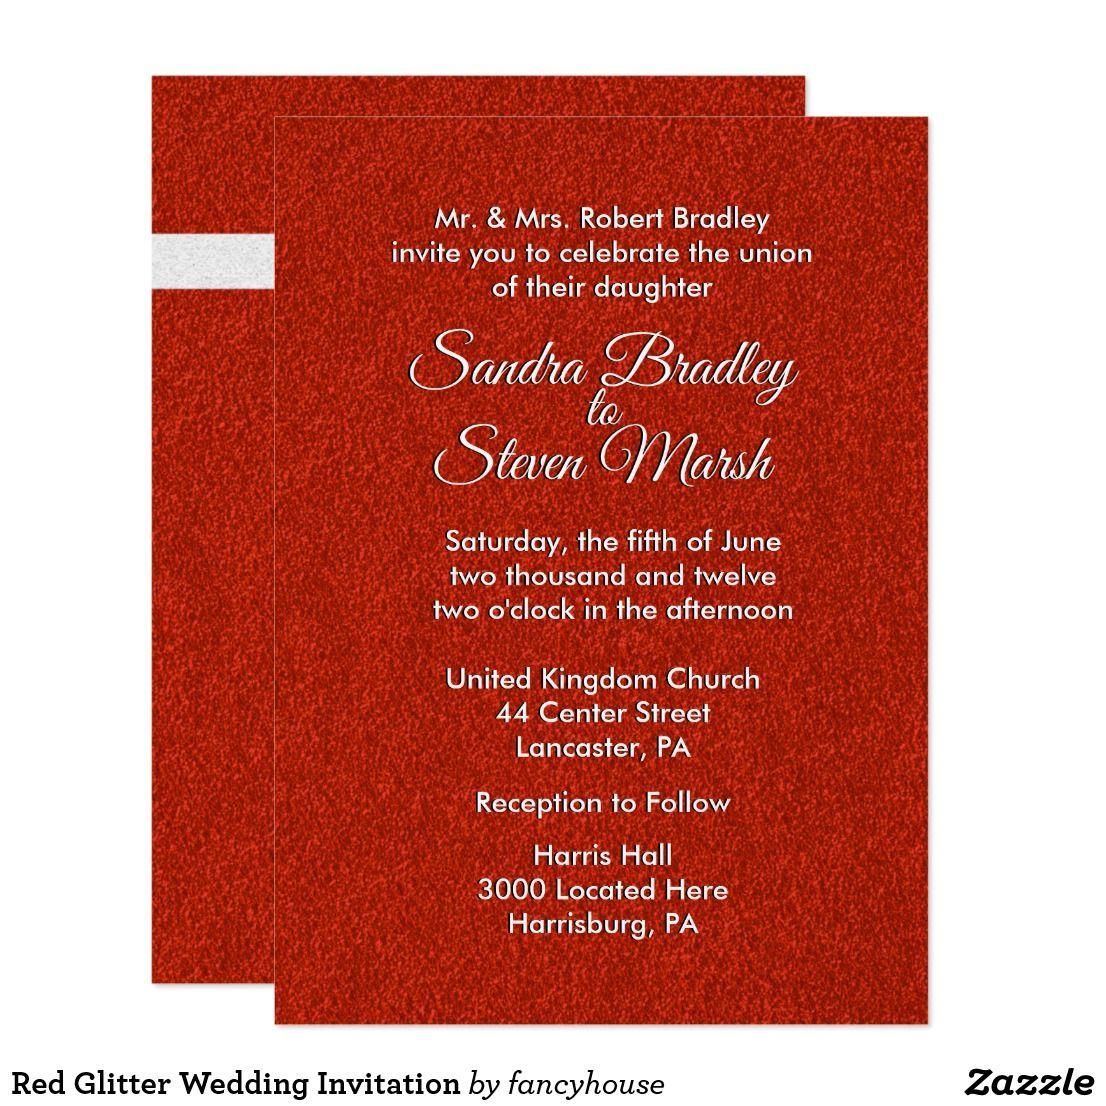 Amazing Glitter Wedding Invitation Sets Images - Invitations and ...